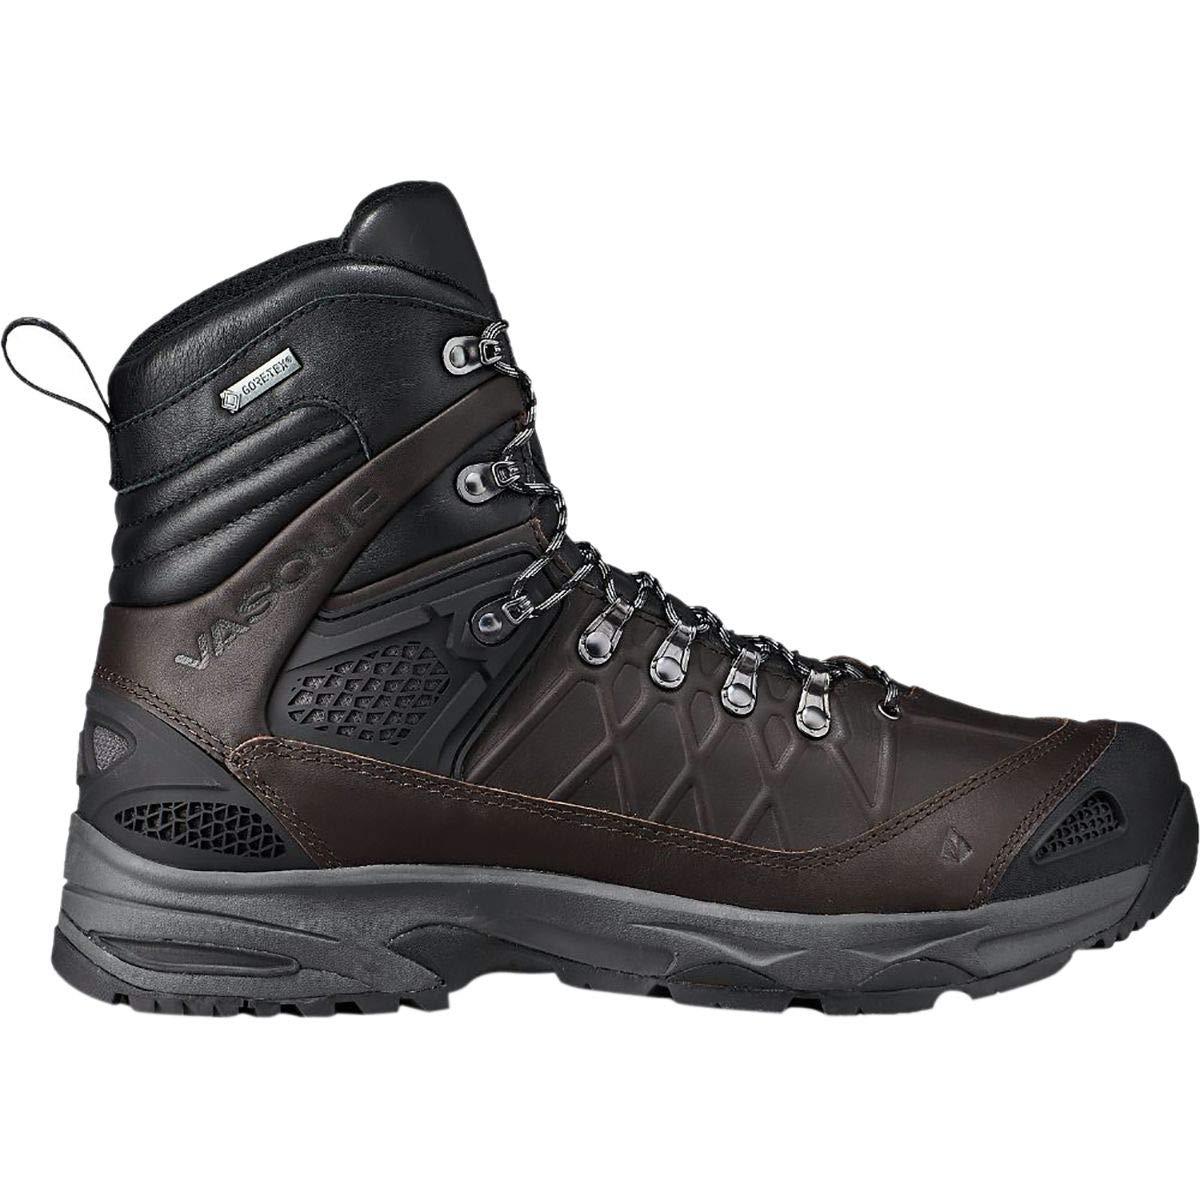 Vasque Saga GTX Leather Backpacking Boot - Men's Coffee Bean, 10.5 by Vasque